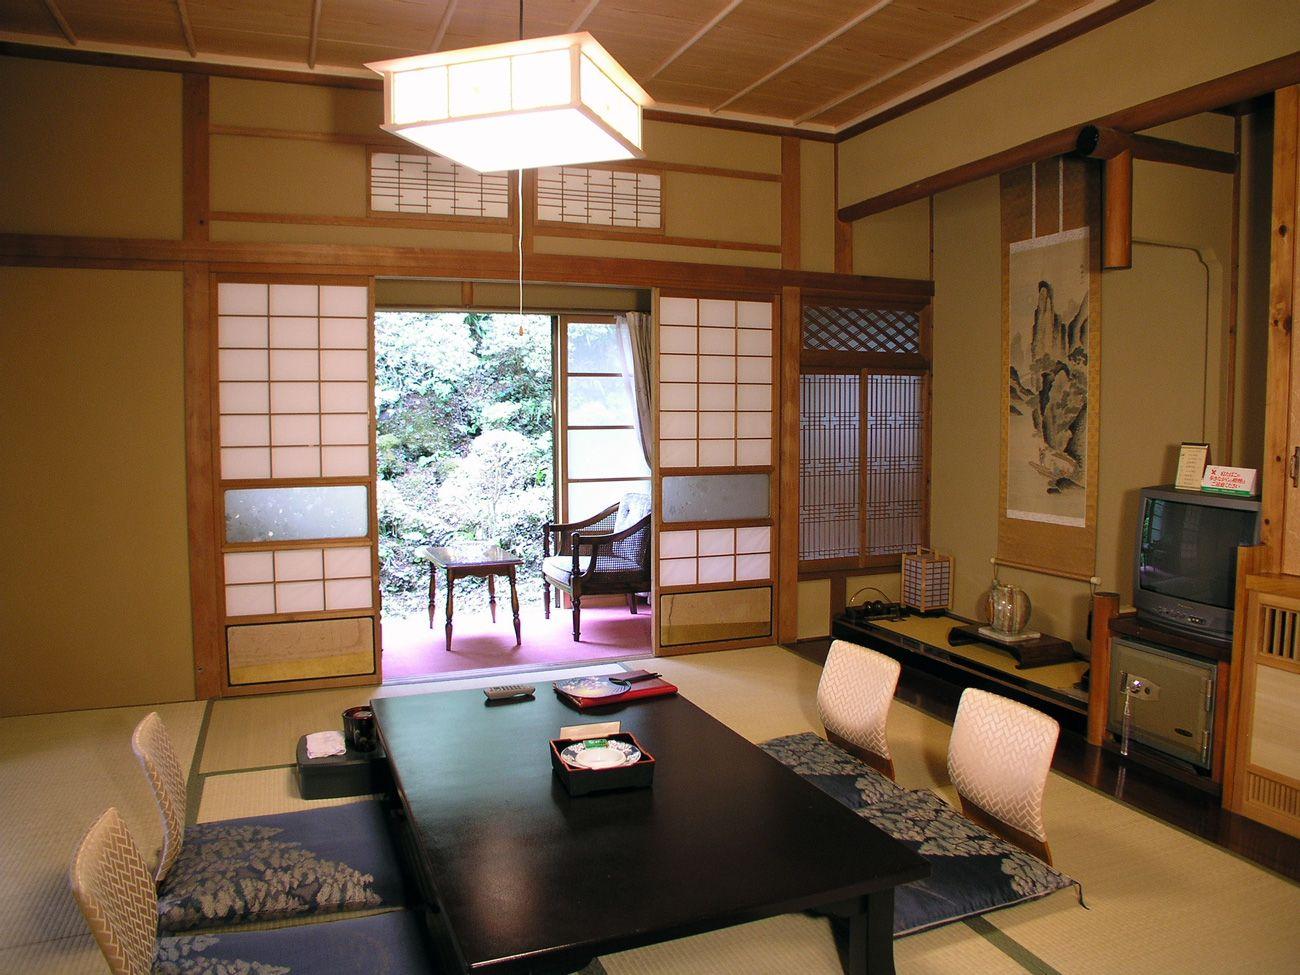 Http://www.ryokan Tsuruya.com/english/img/pic/room01 | Salon Japonais |  Pinterest | Japanese Kitchen, Tatami Room And Kitchens Part 77